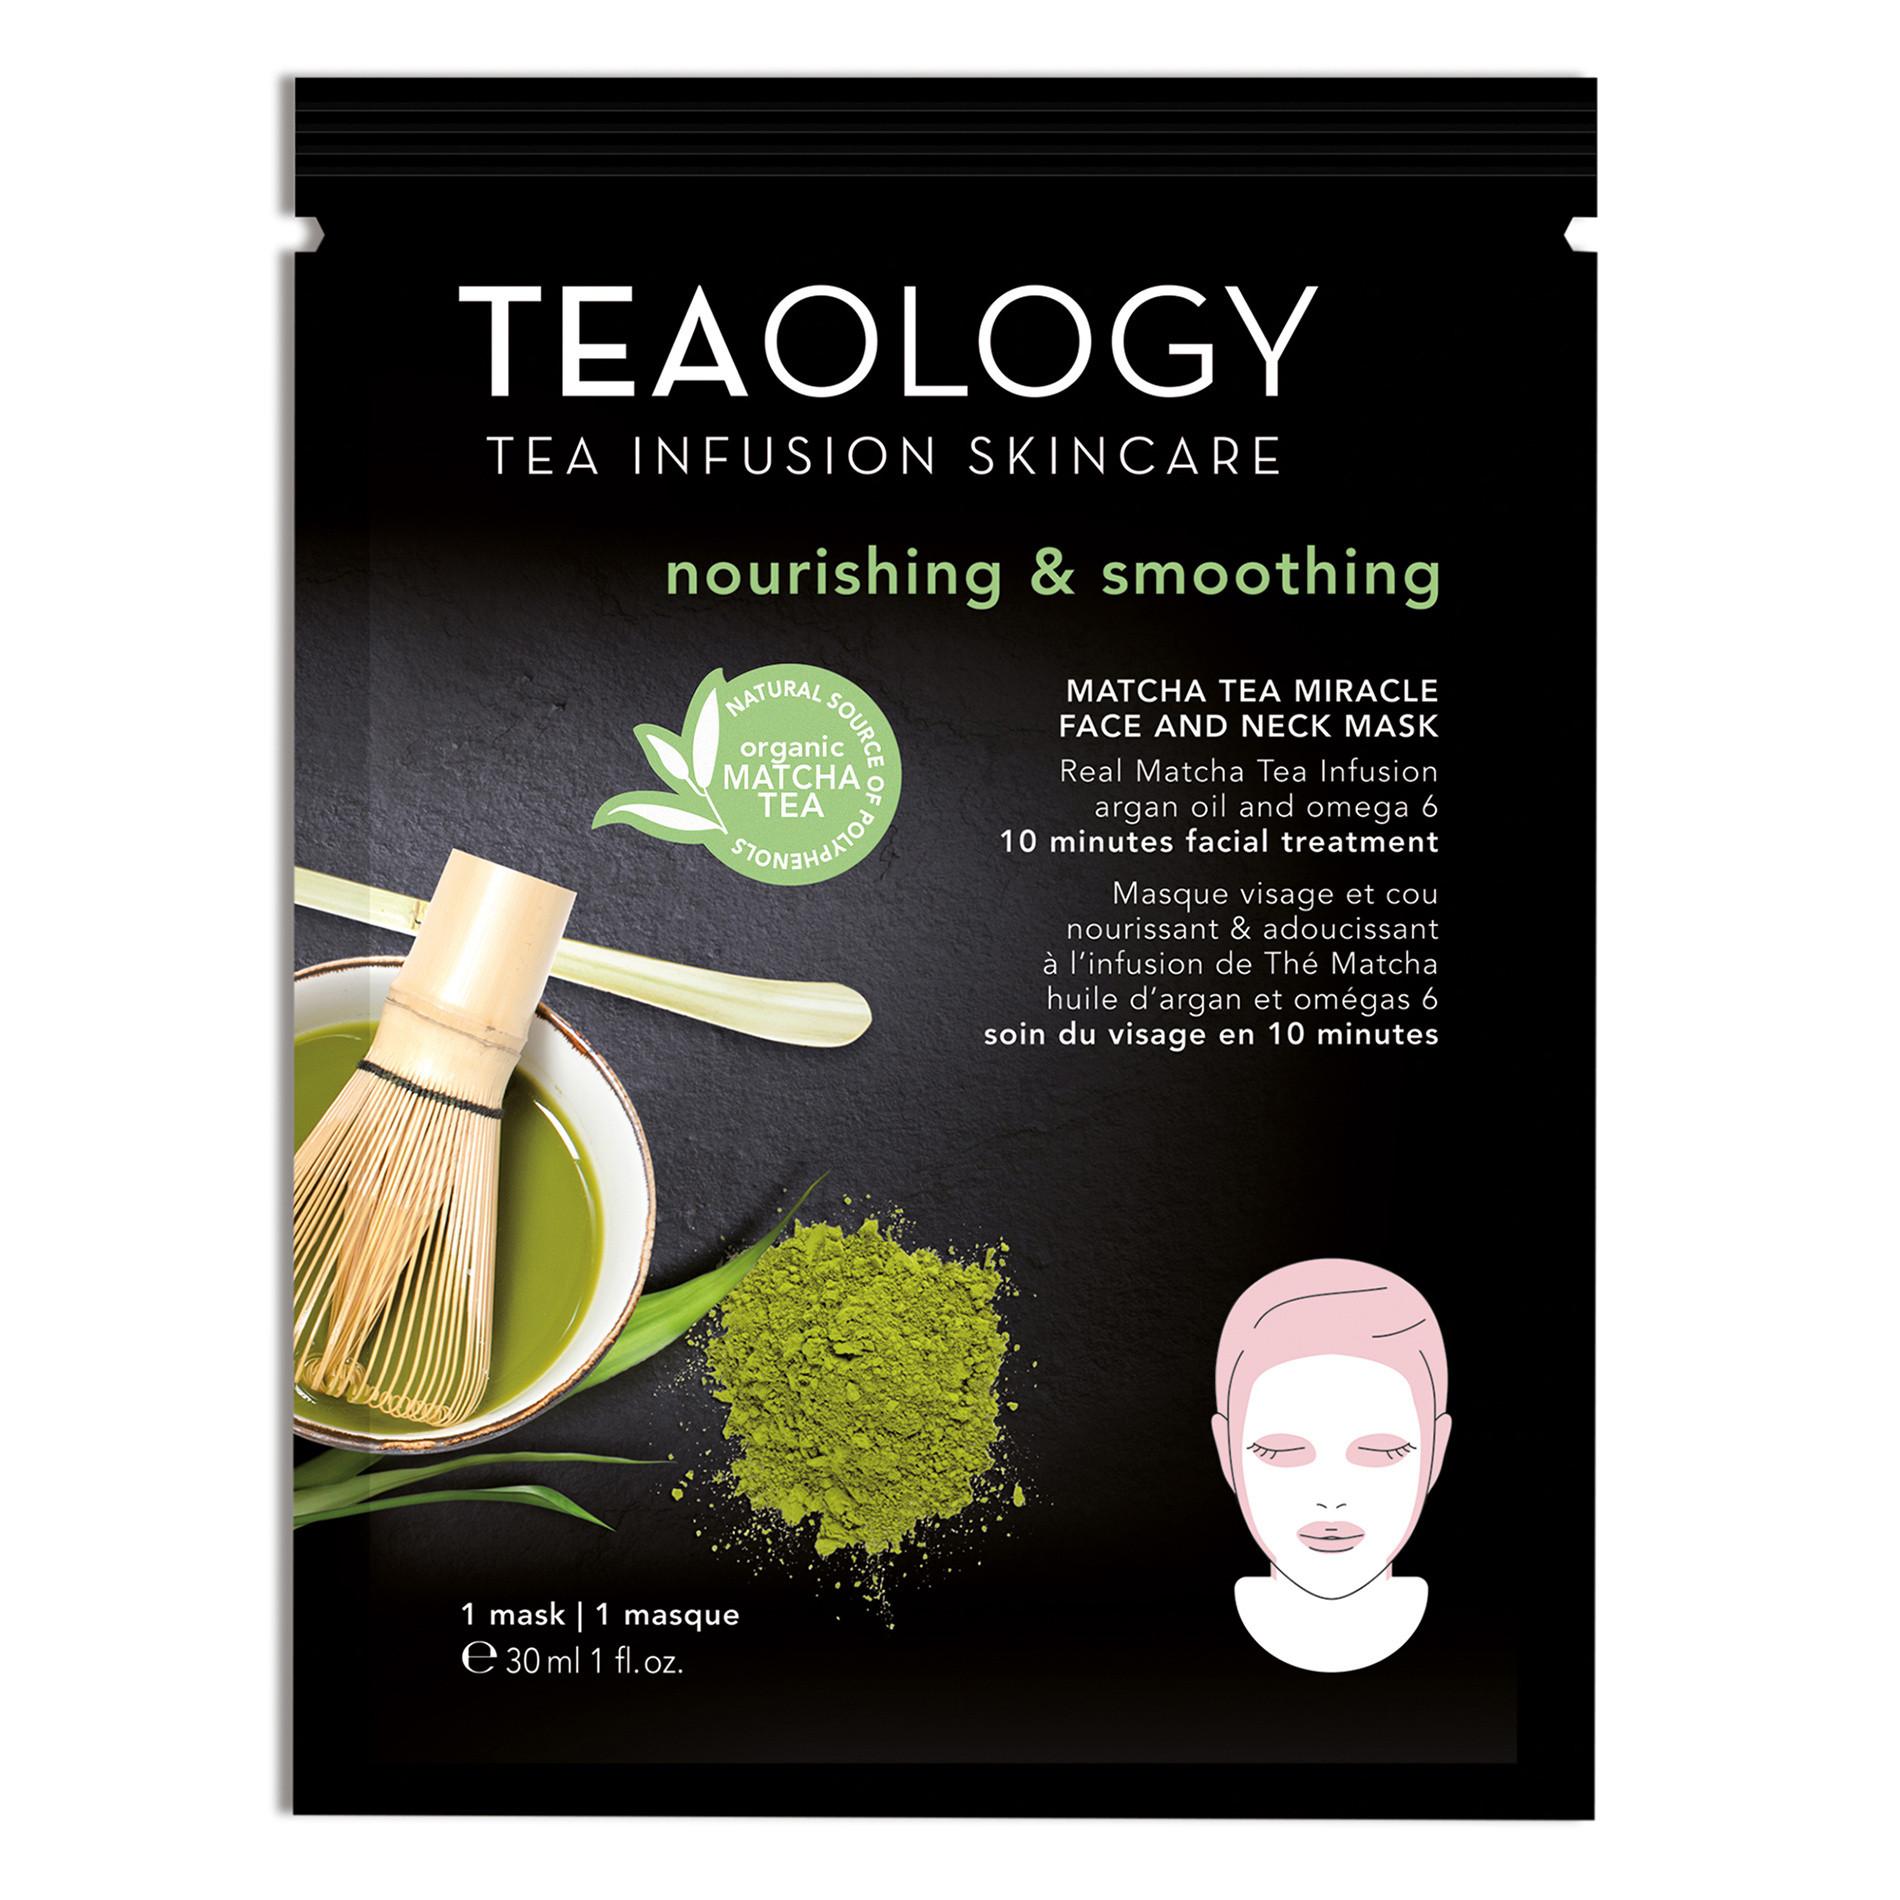 Matcha Tea Miracle Face and Neck Mask Nutriente e Levigante 30 ml, Nero, large image number 0